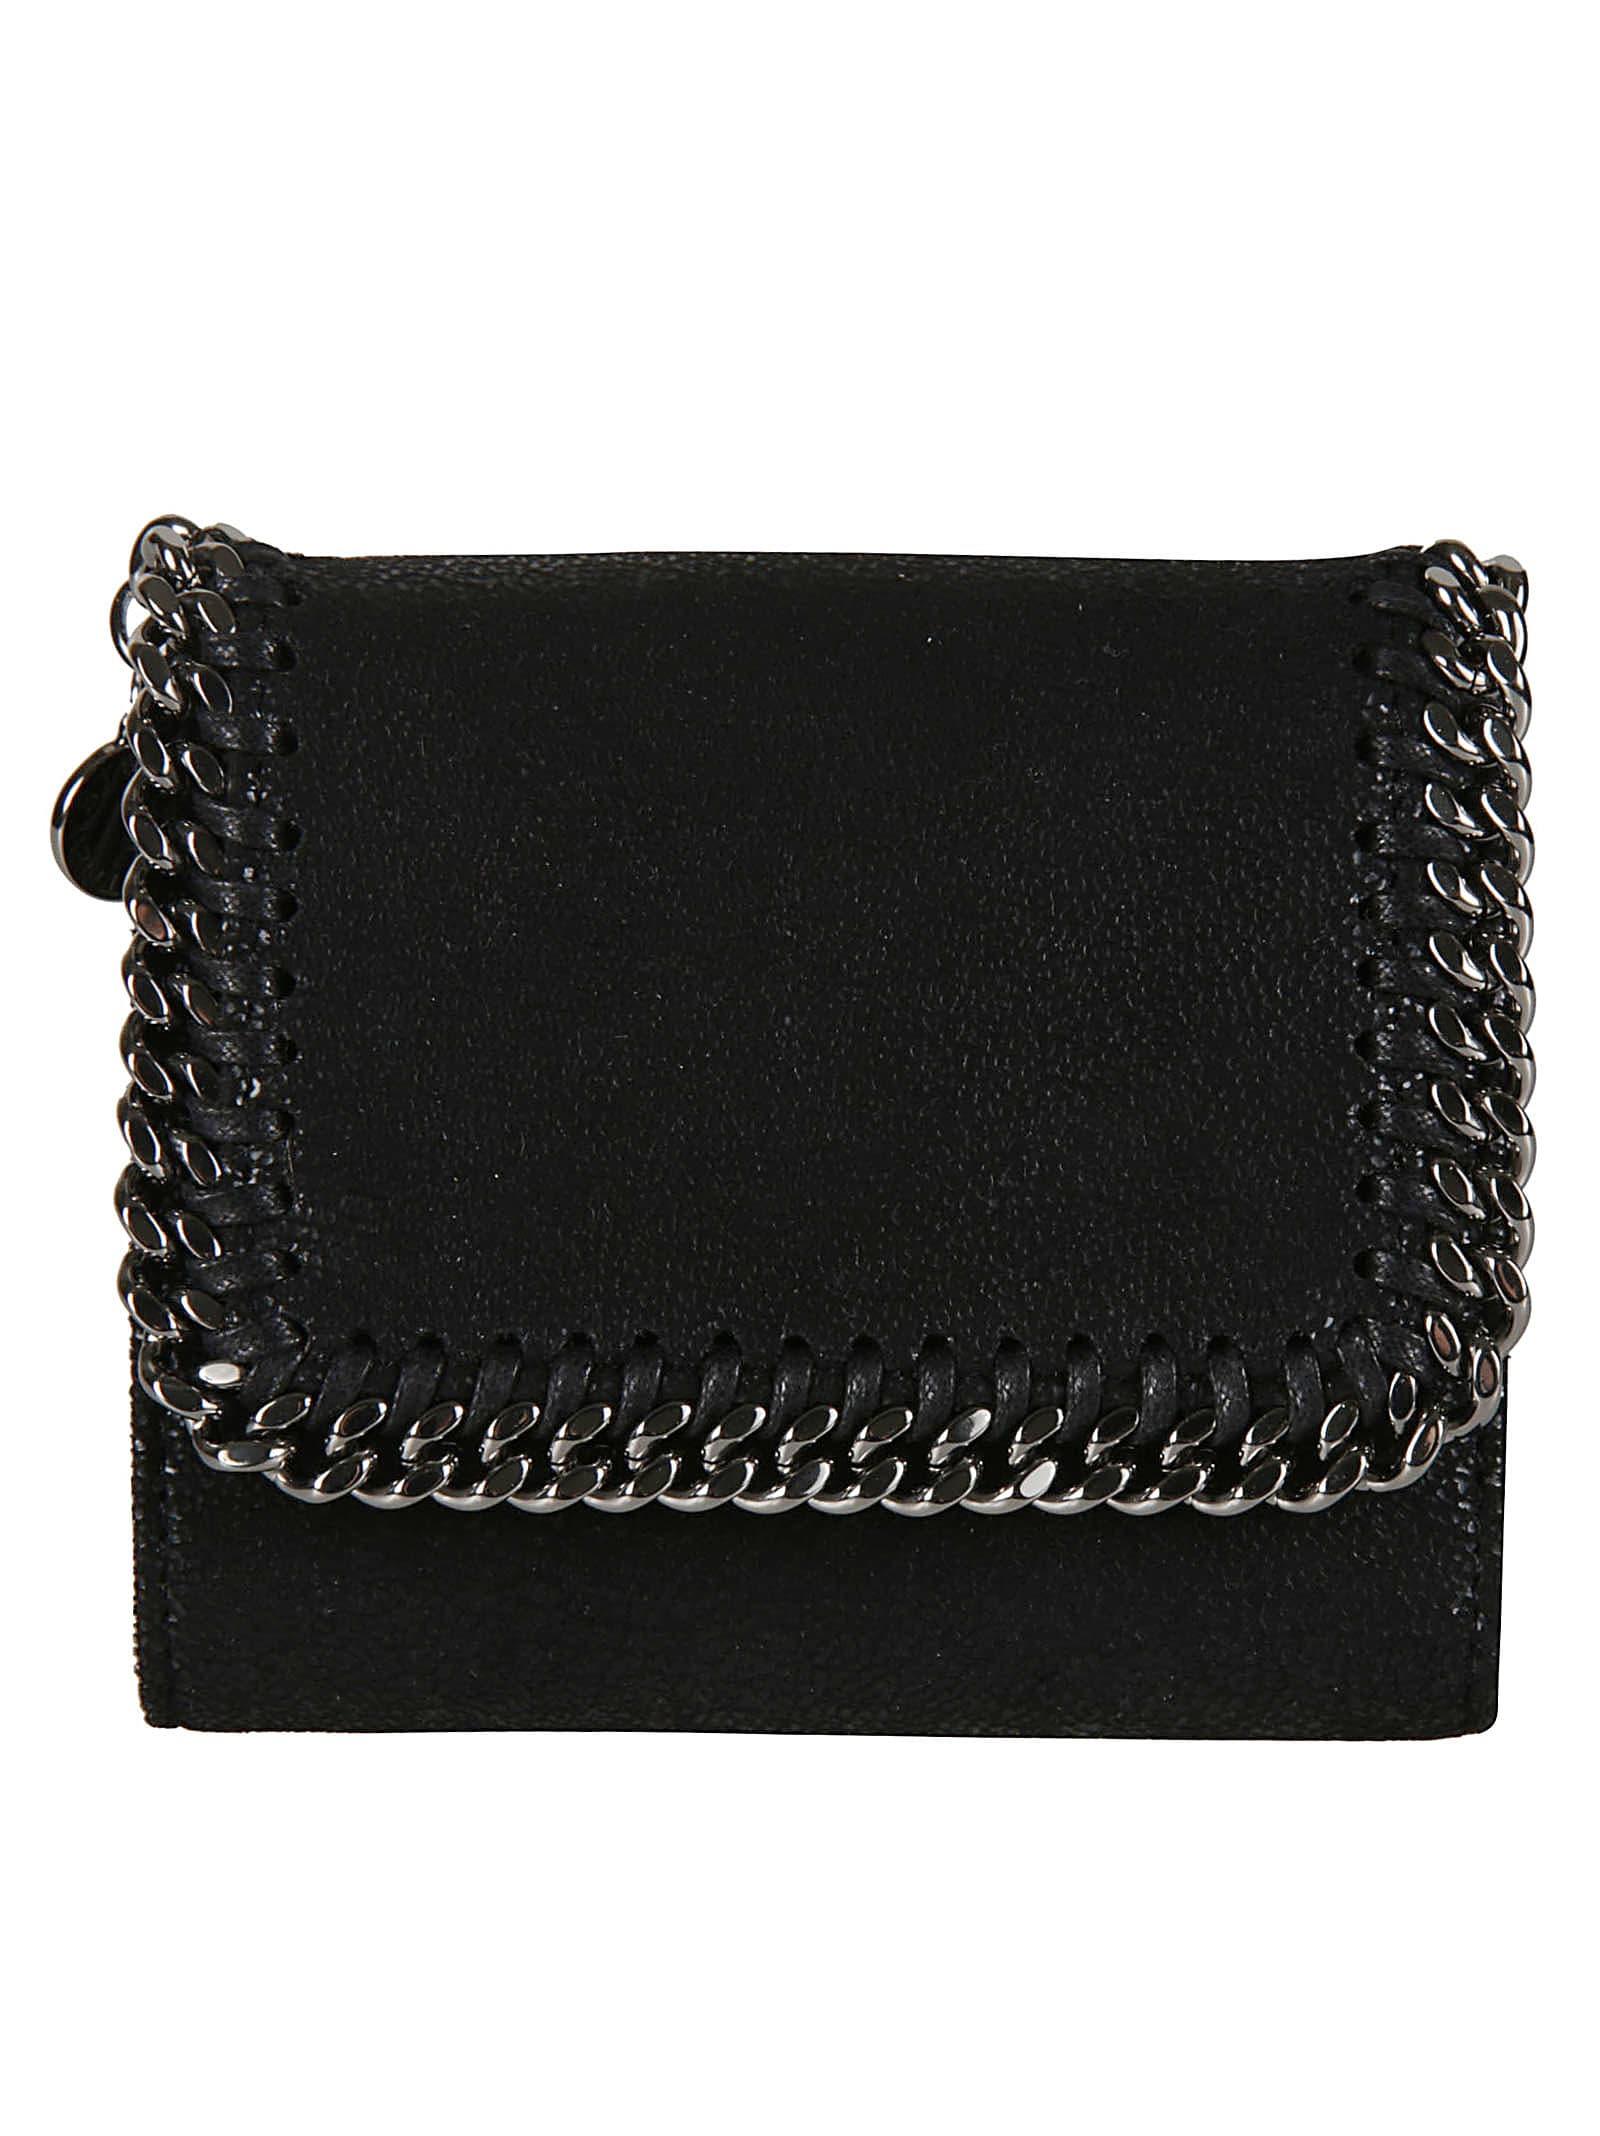 Stella McCartney Small Flap Binded Wallet